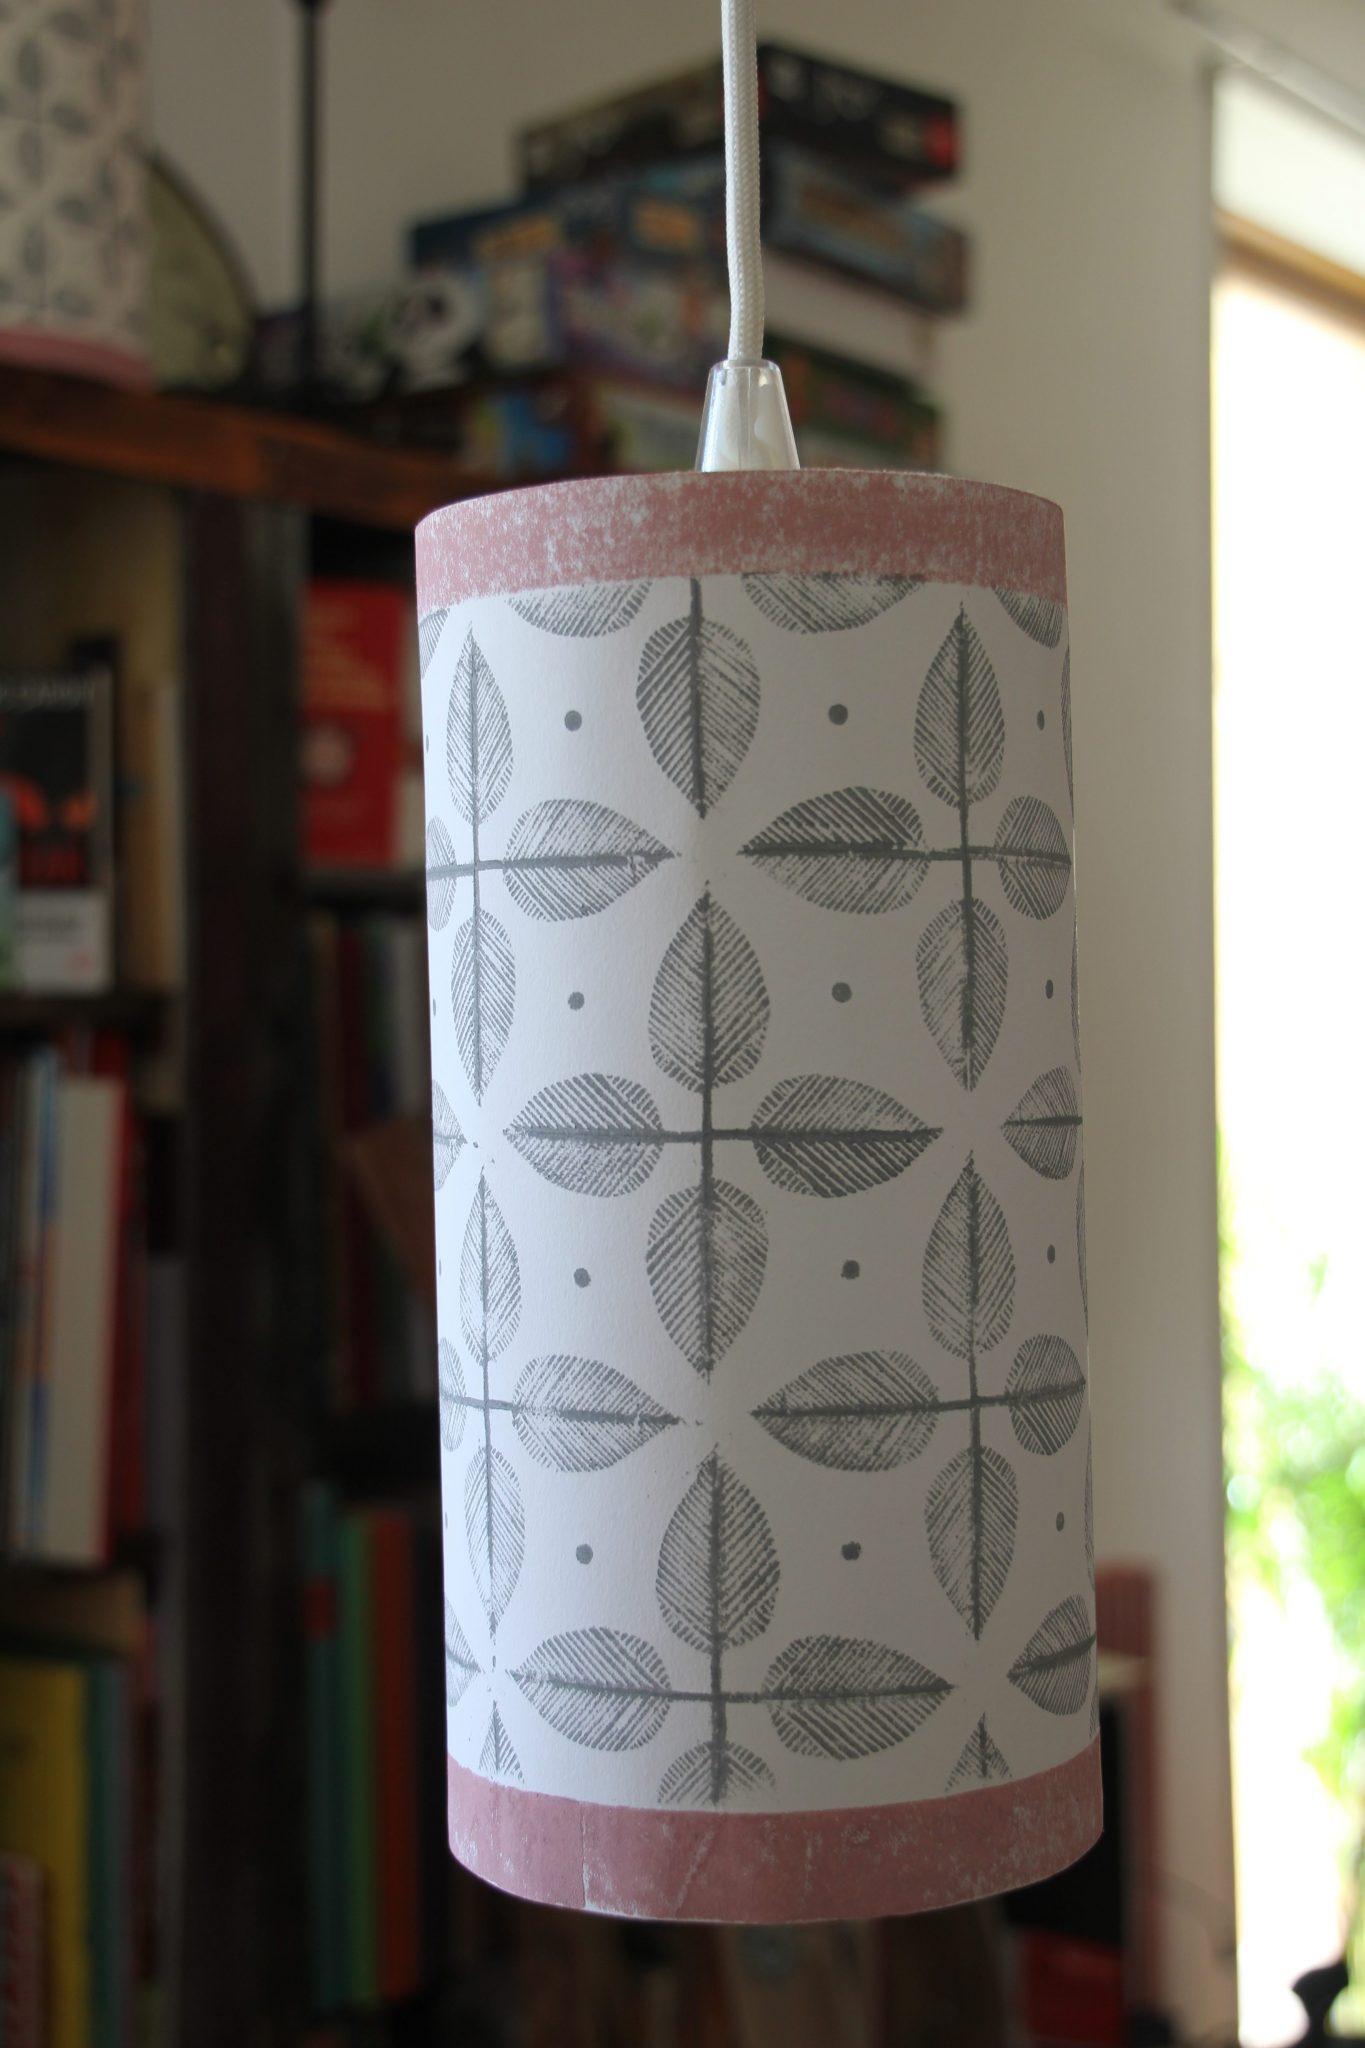 lampe suspendue | LinoLino | Linogravure | Créations artisanales